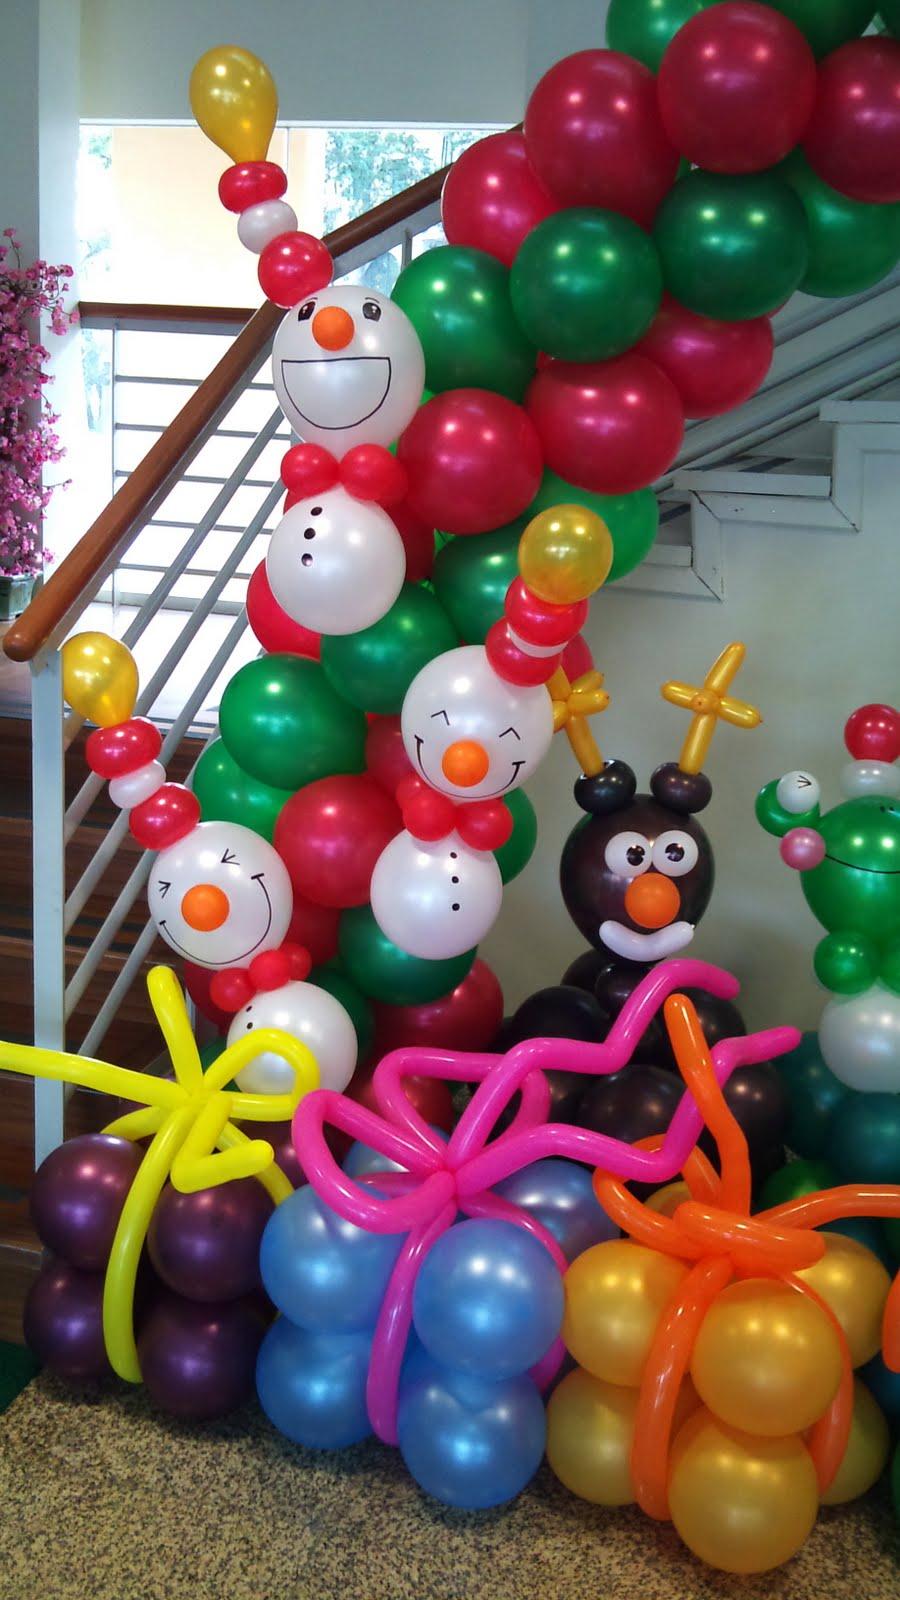 Balloon decorations for weddings birthday parties for Decoracion original